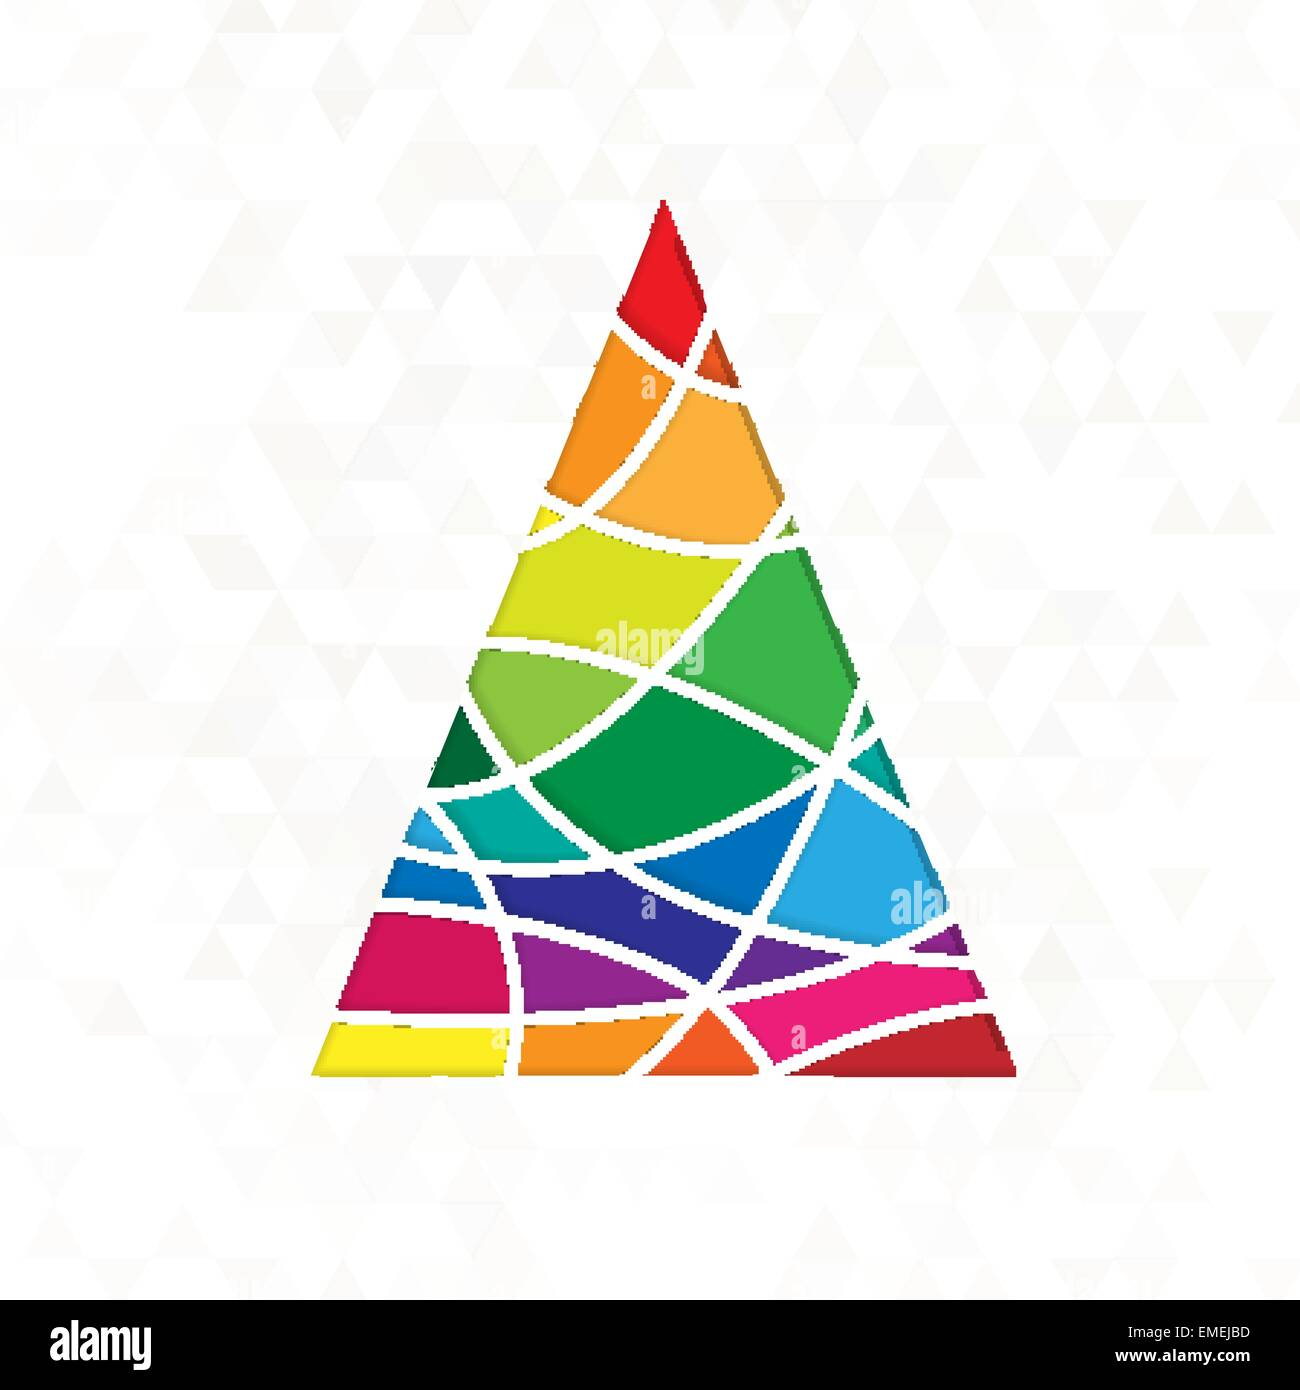 tree in rainbow colors - Stock Image